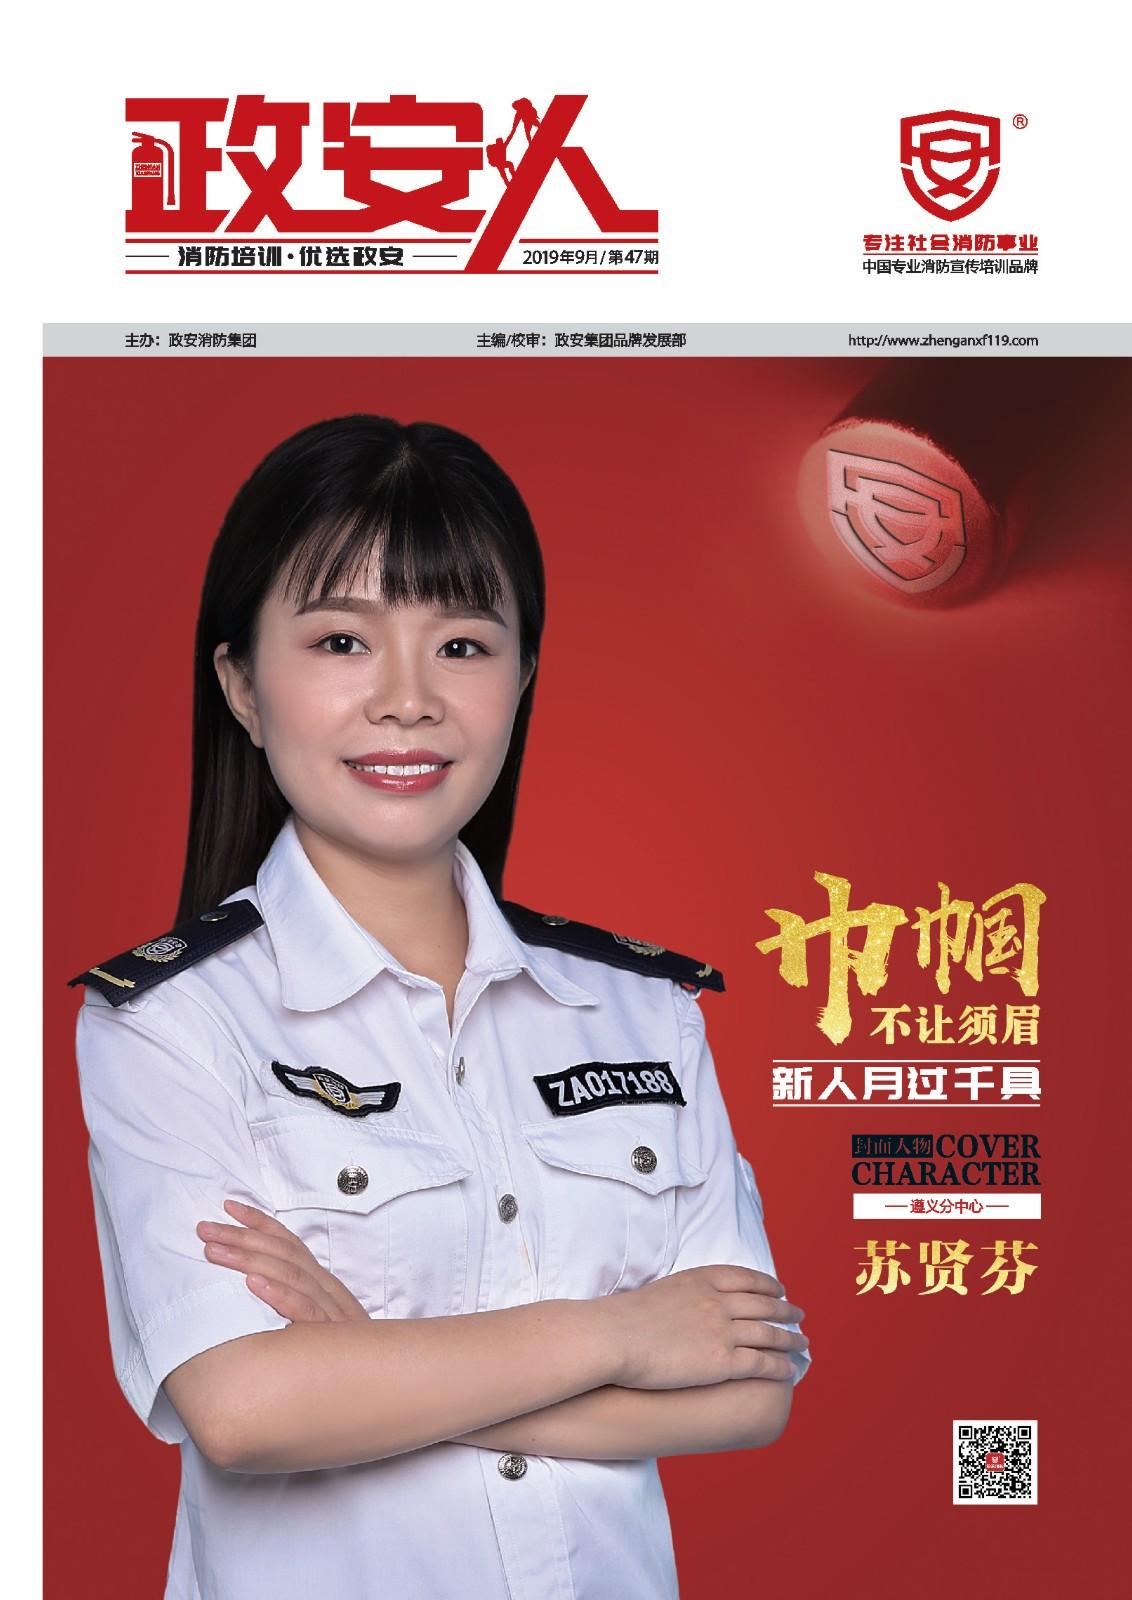 《政安人》2019年9月刊